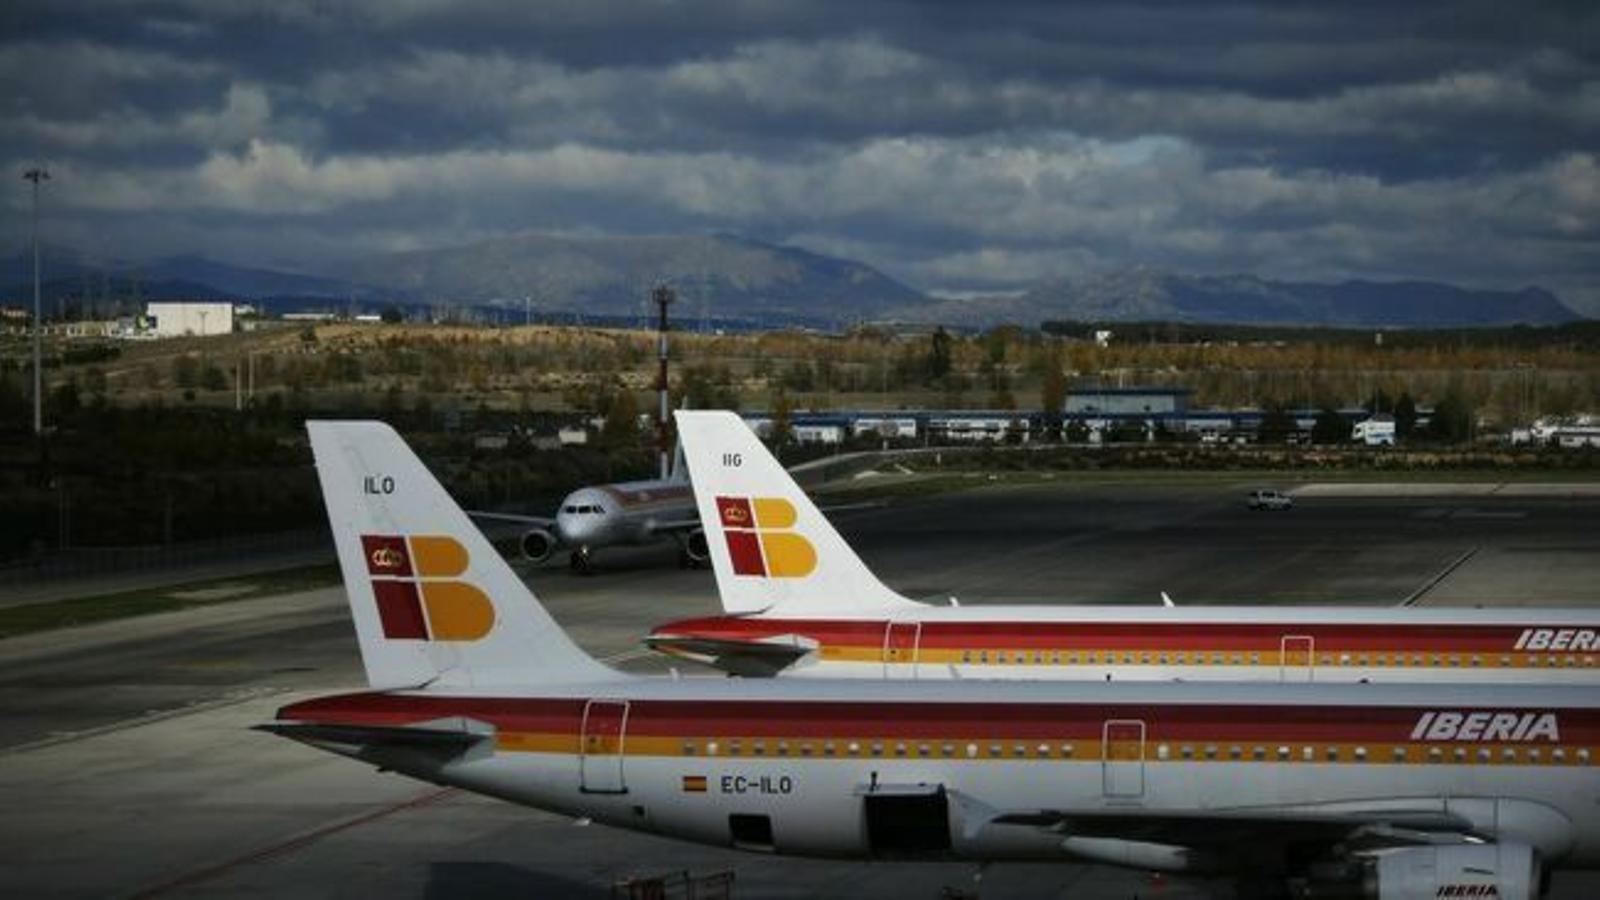 Flota d'Iberia